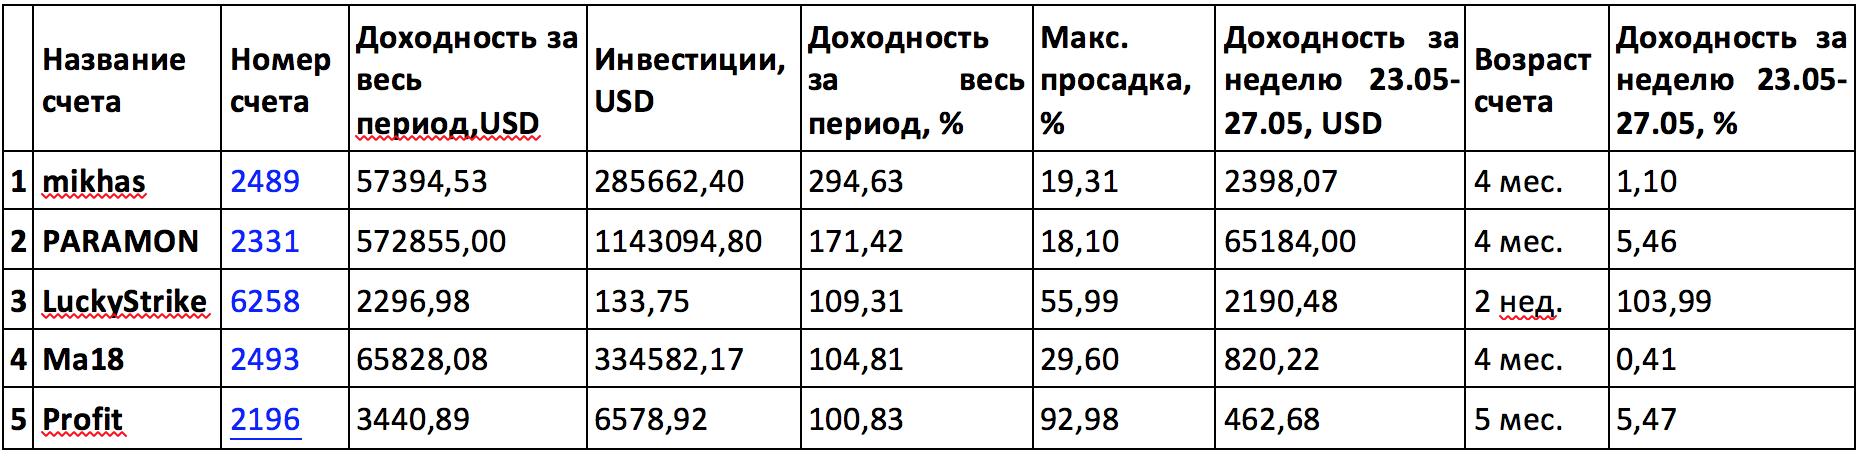 ТОП-5 ПАММ-счетов PrivateFX